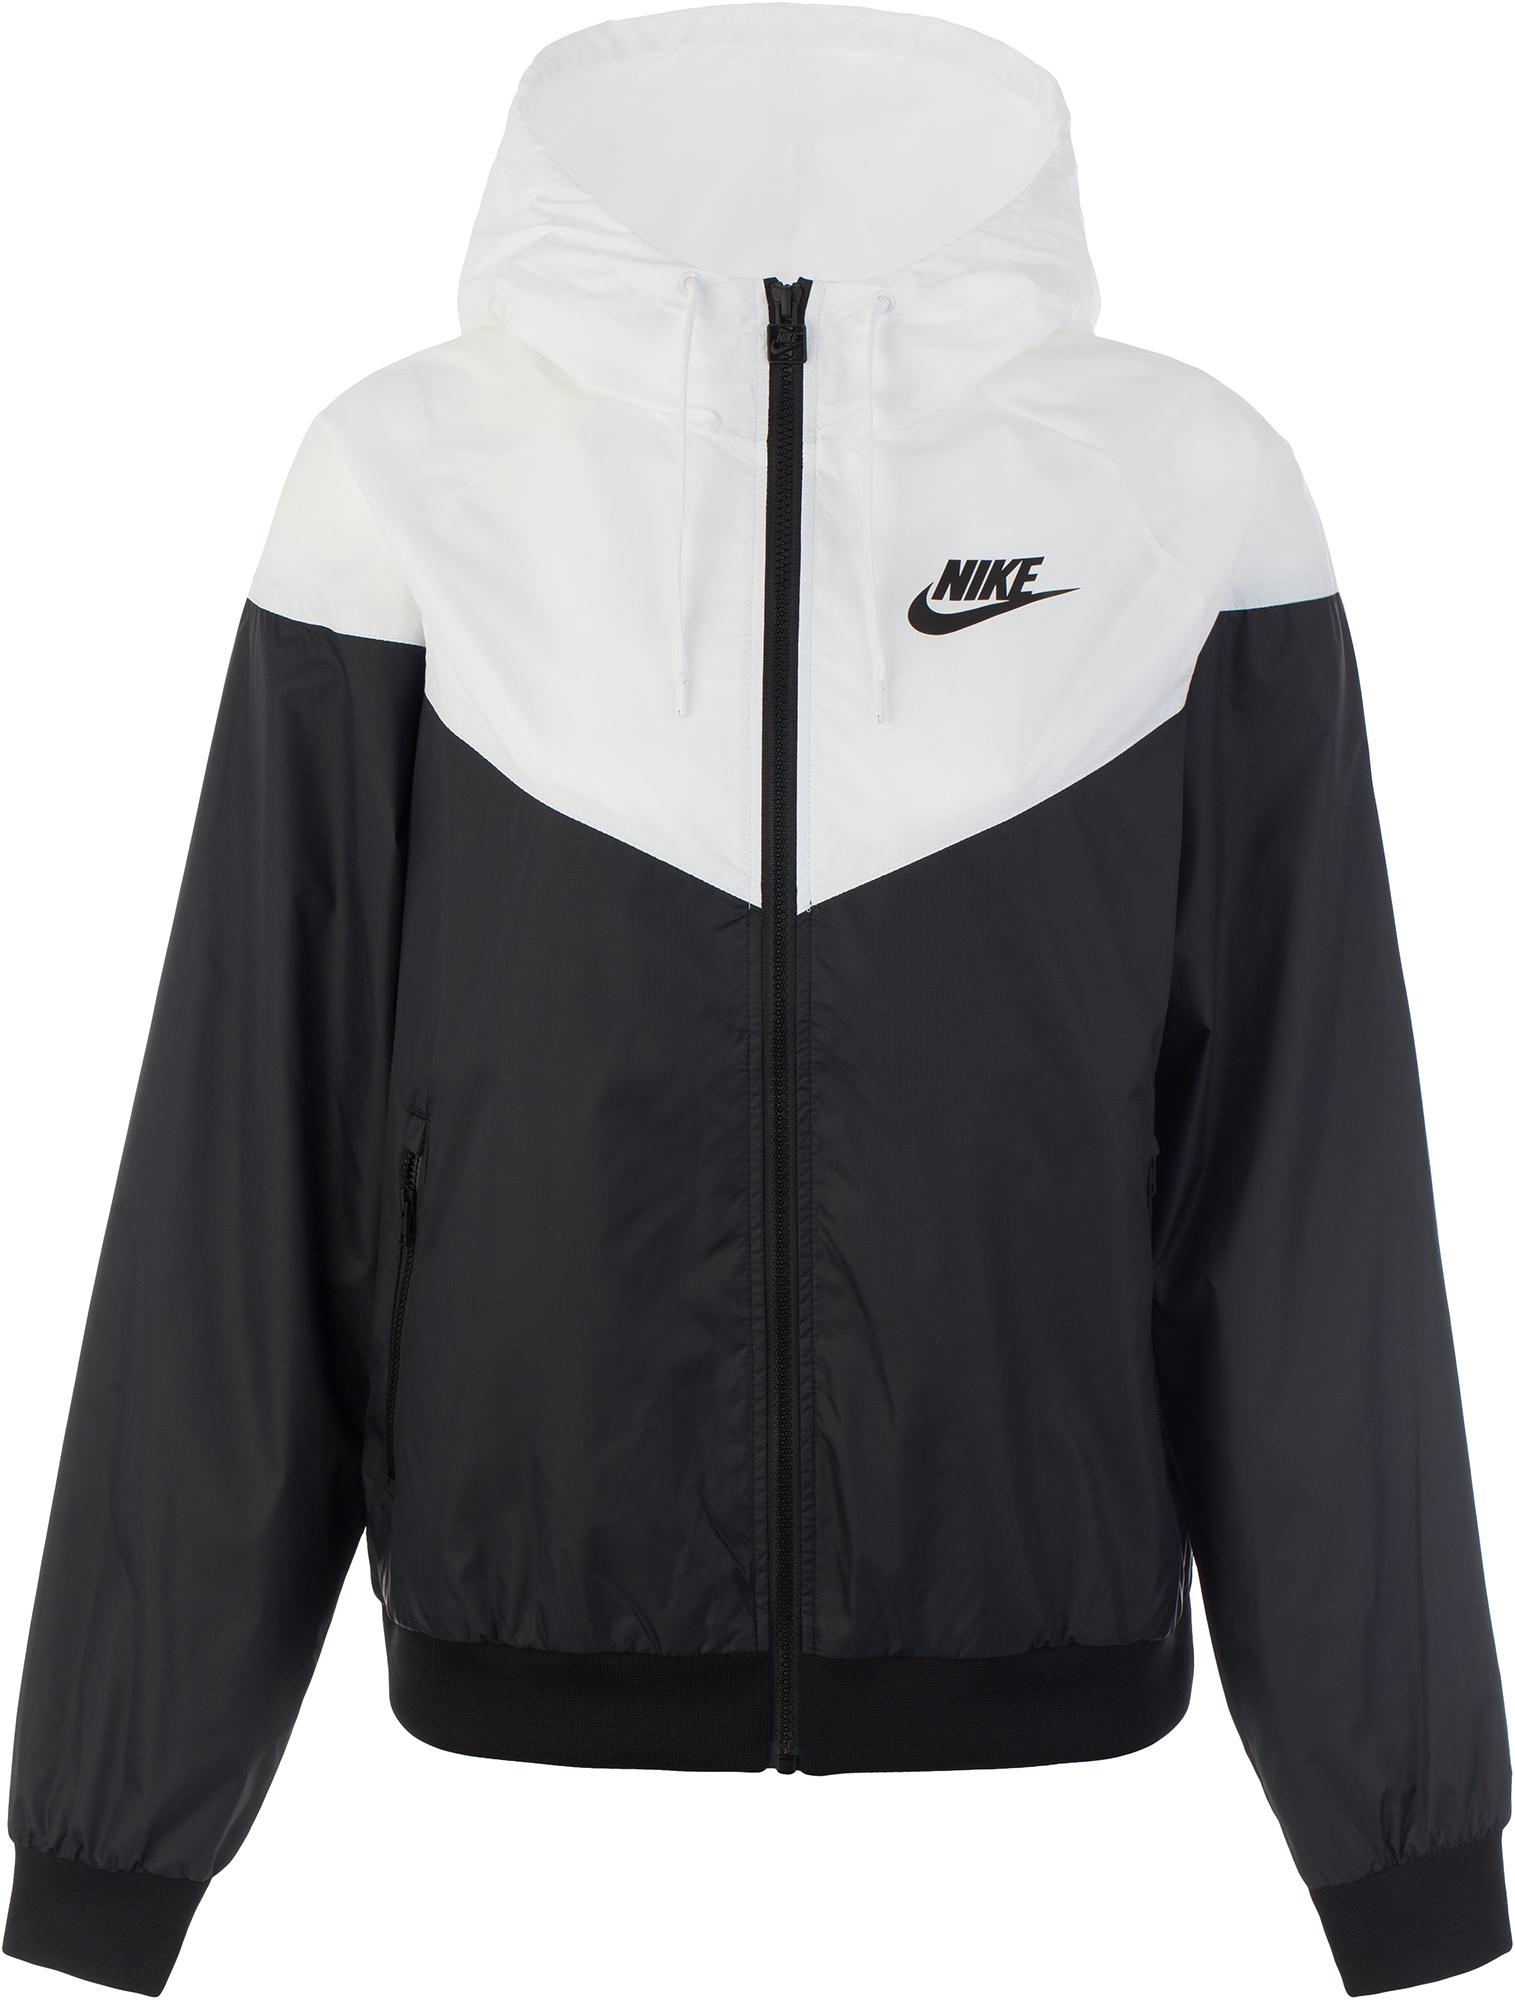 Nike Ветровка женская Nike Sportswear Windrunner, размер 48-50 nike бриджи женские nike sportswear vintage размер 48 50